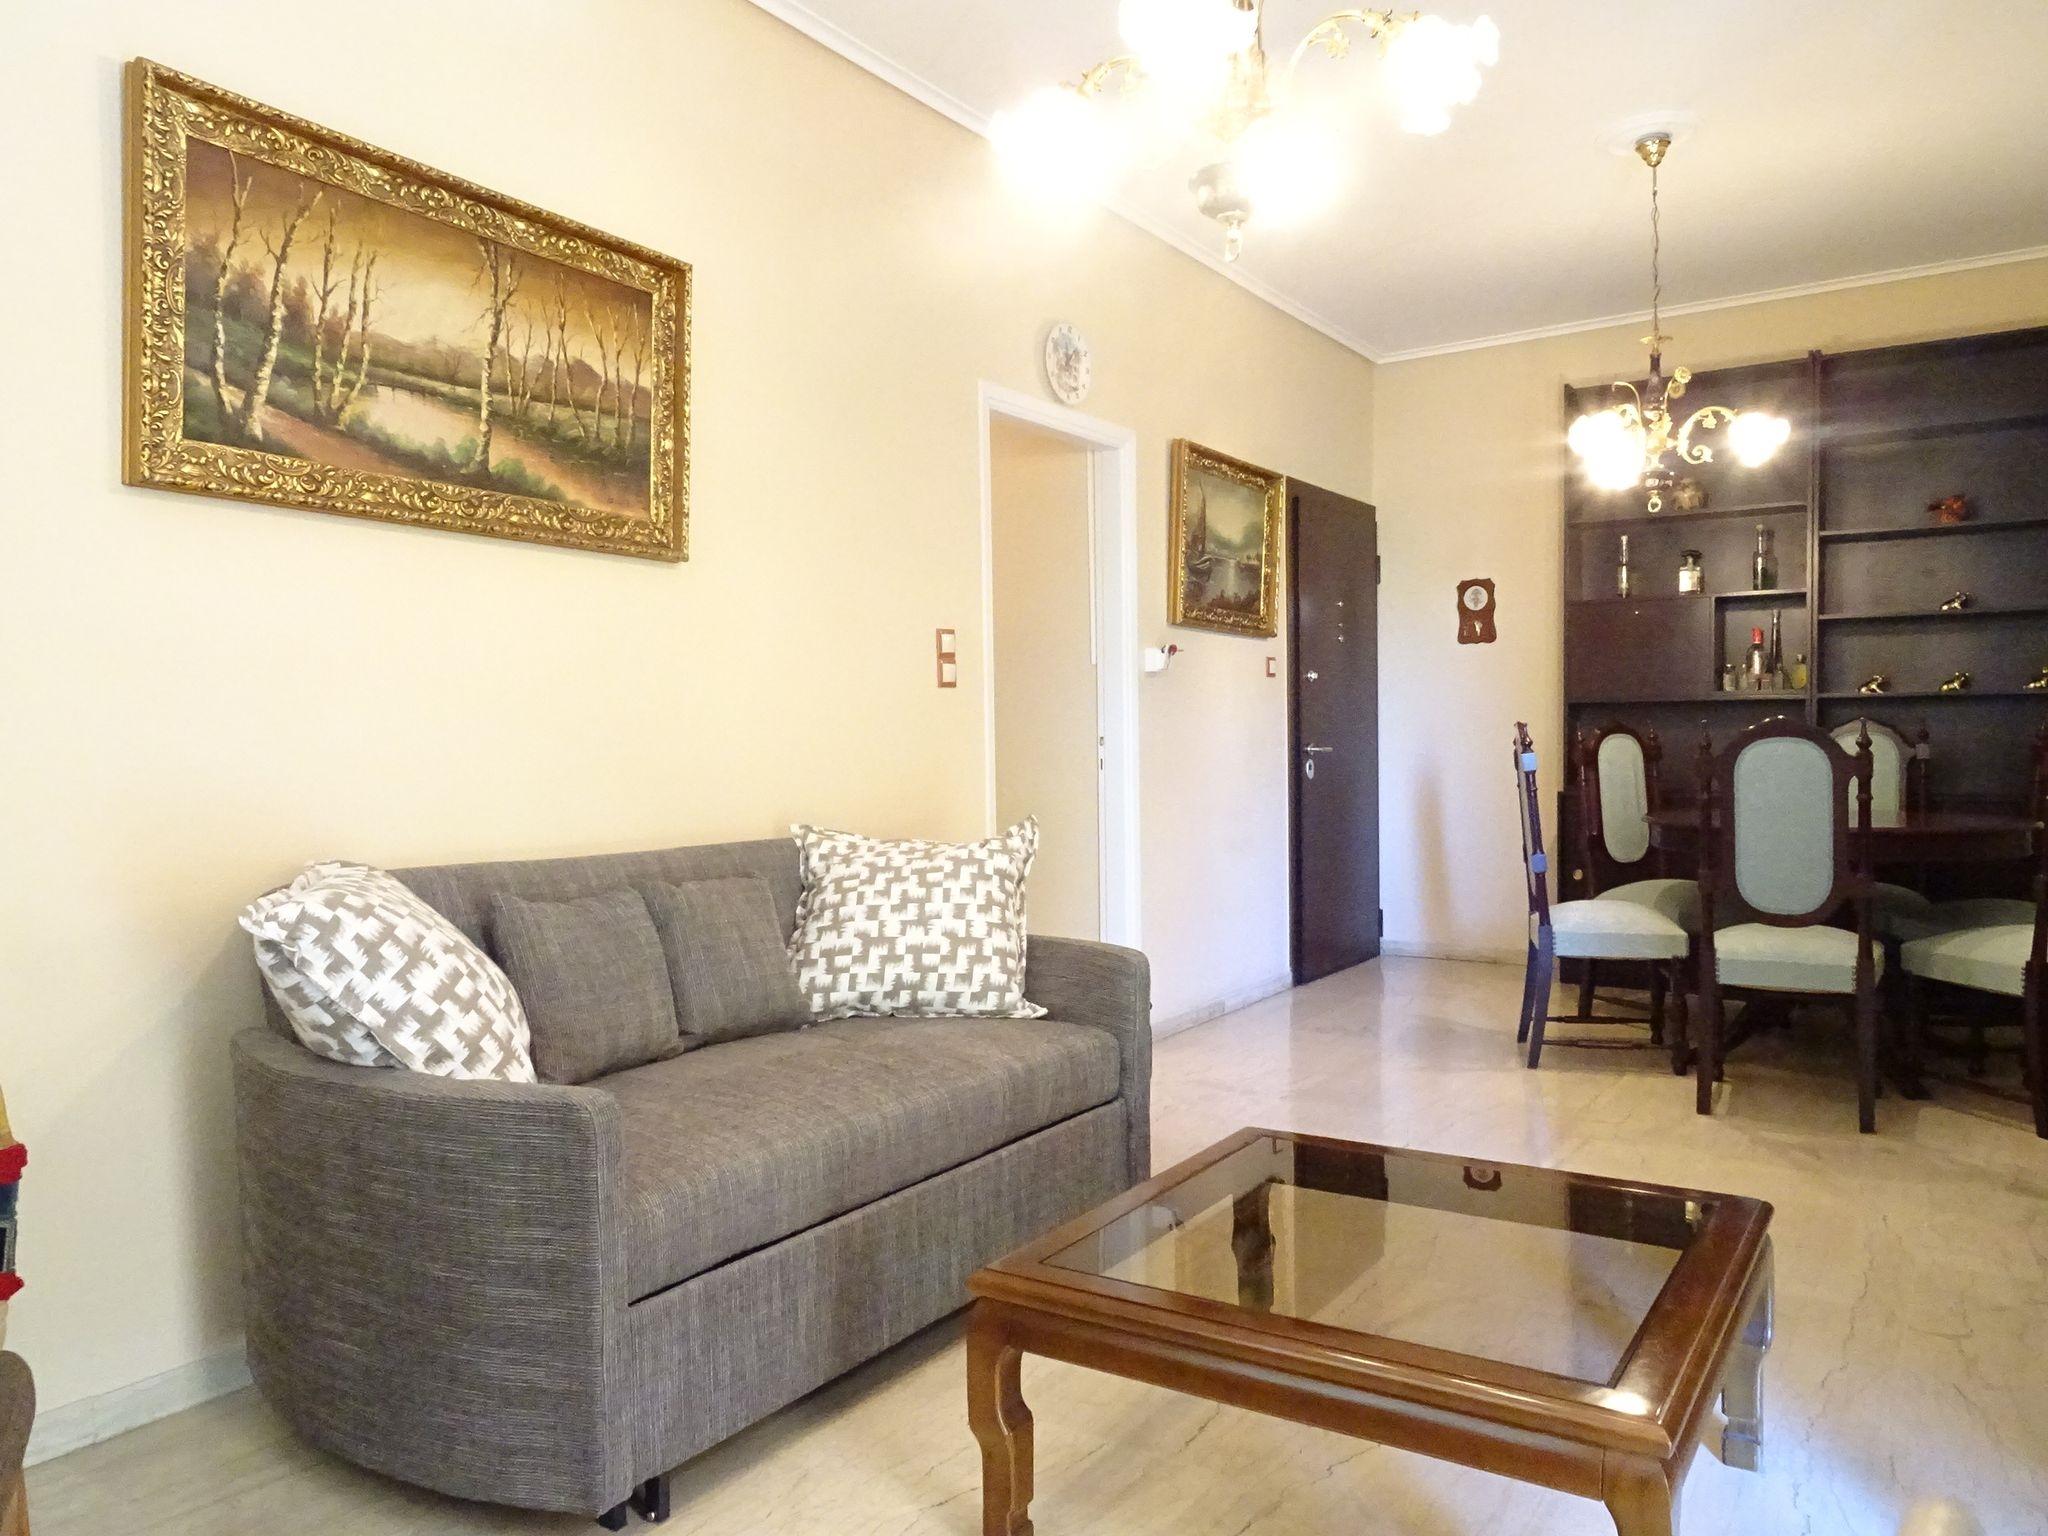 Retro pleasant apartment with Acropolis view